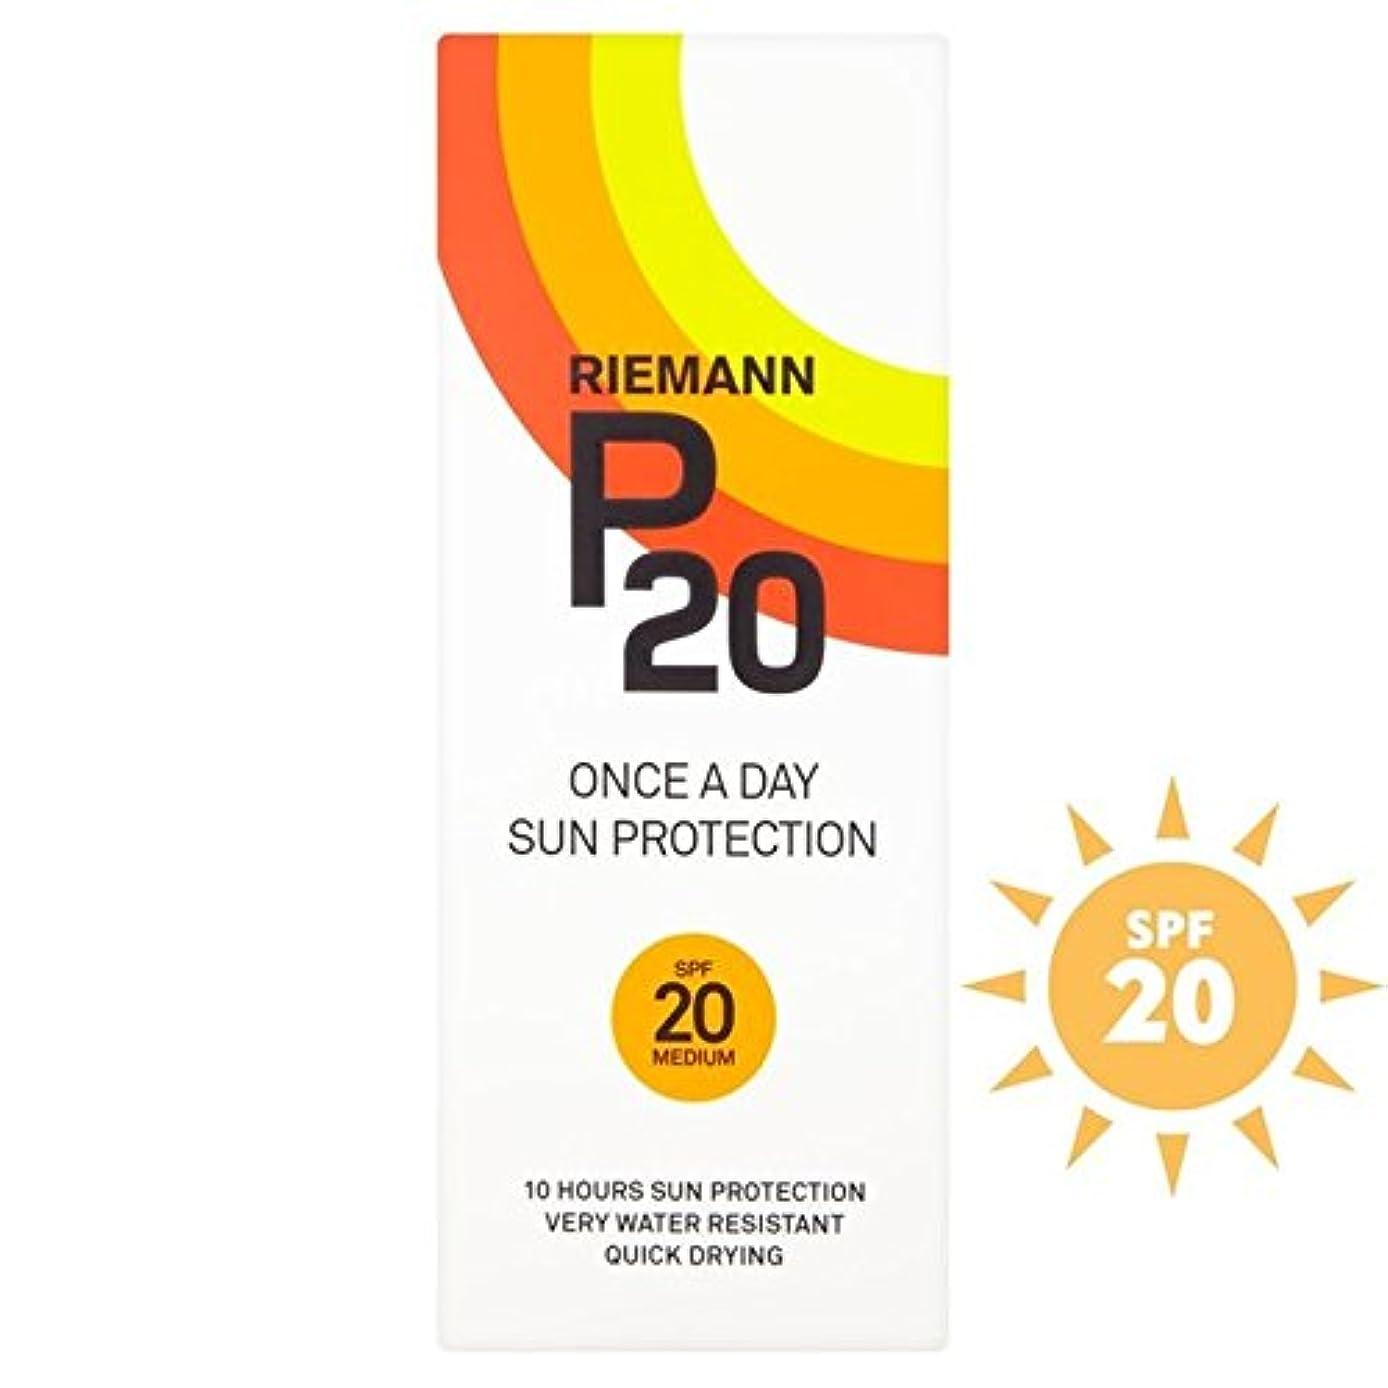 Riemann P20 SPF20 1 Day/10 Hour Protection 200ml - リーマン20 20 1日/ 10時間の保護200ミリリットル [並行輸入品]